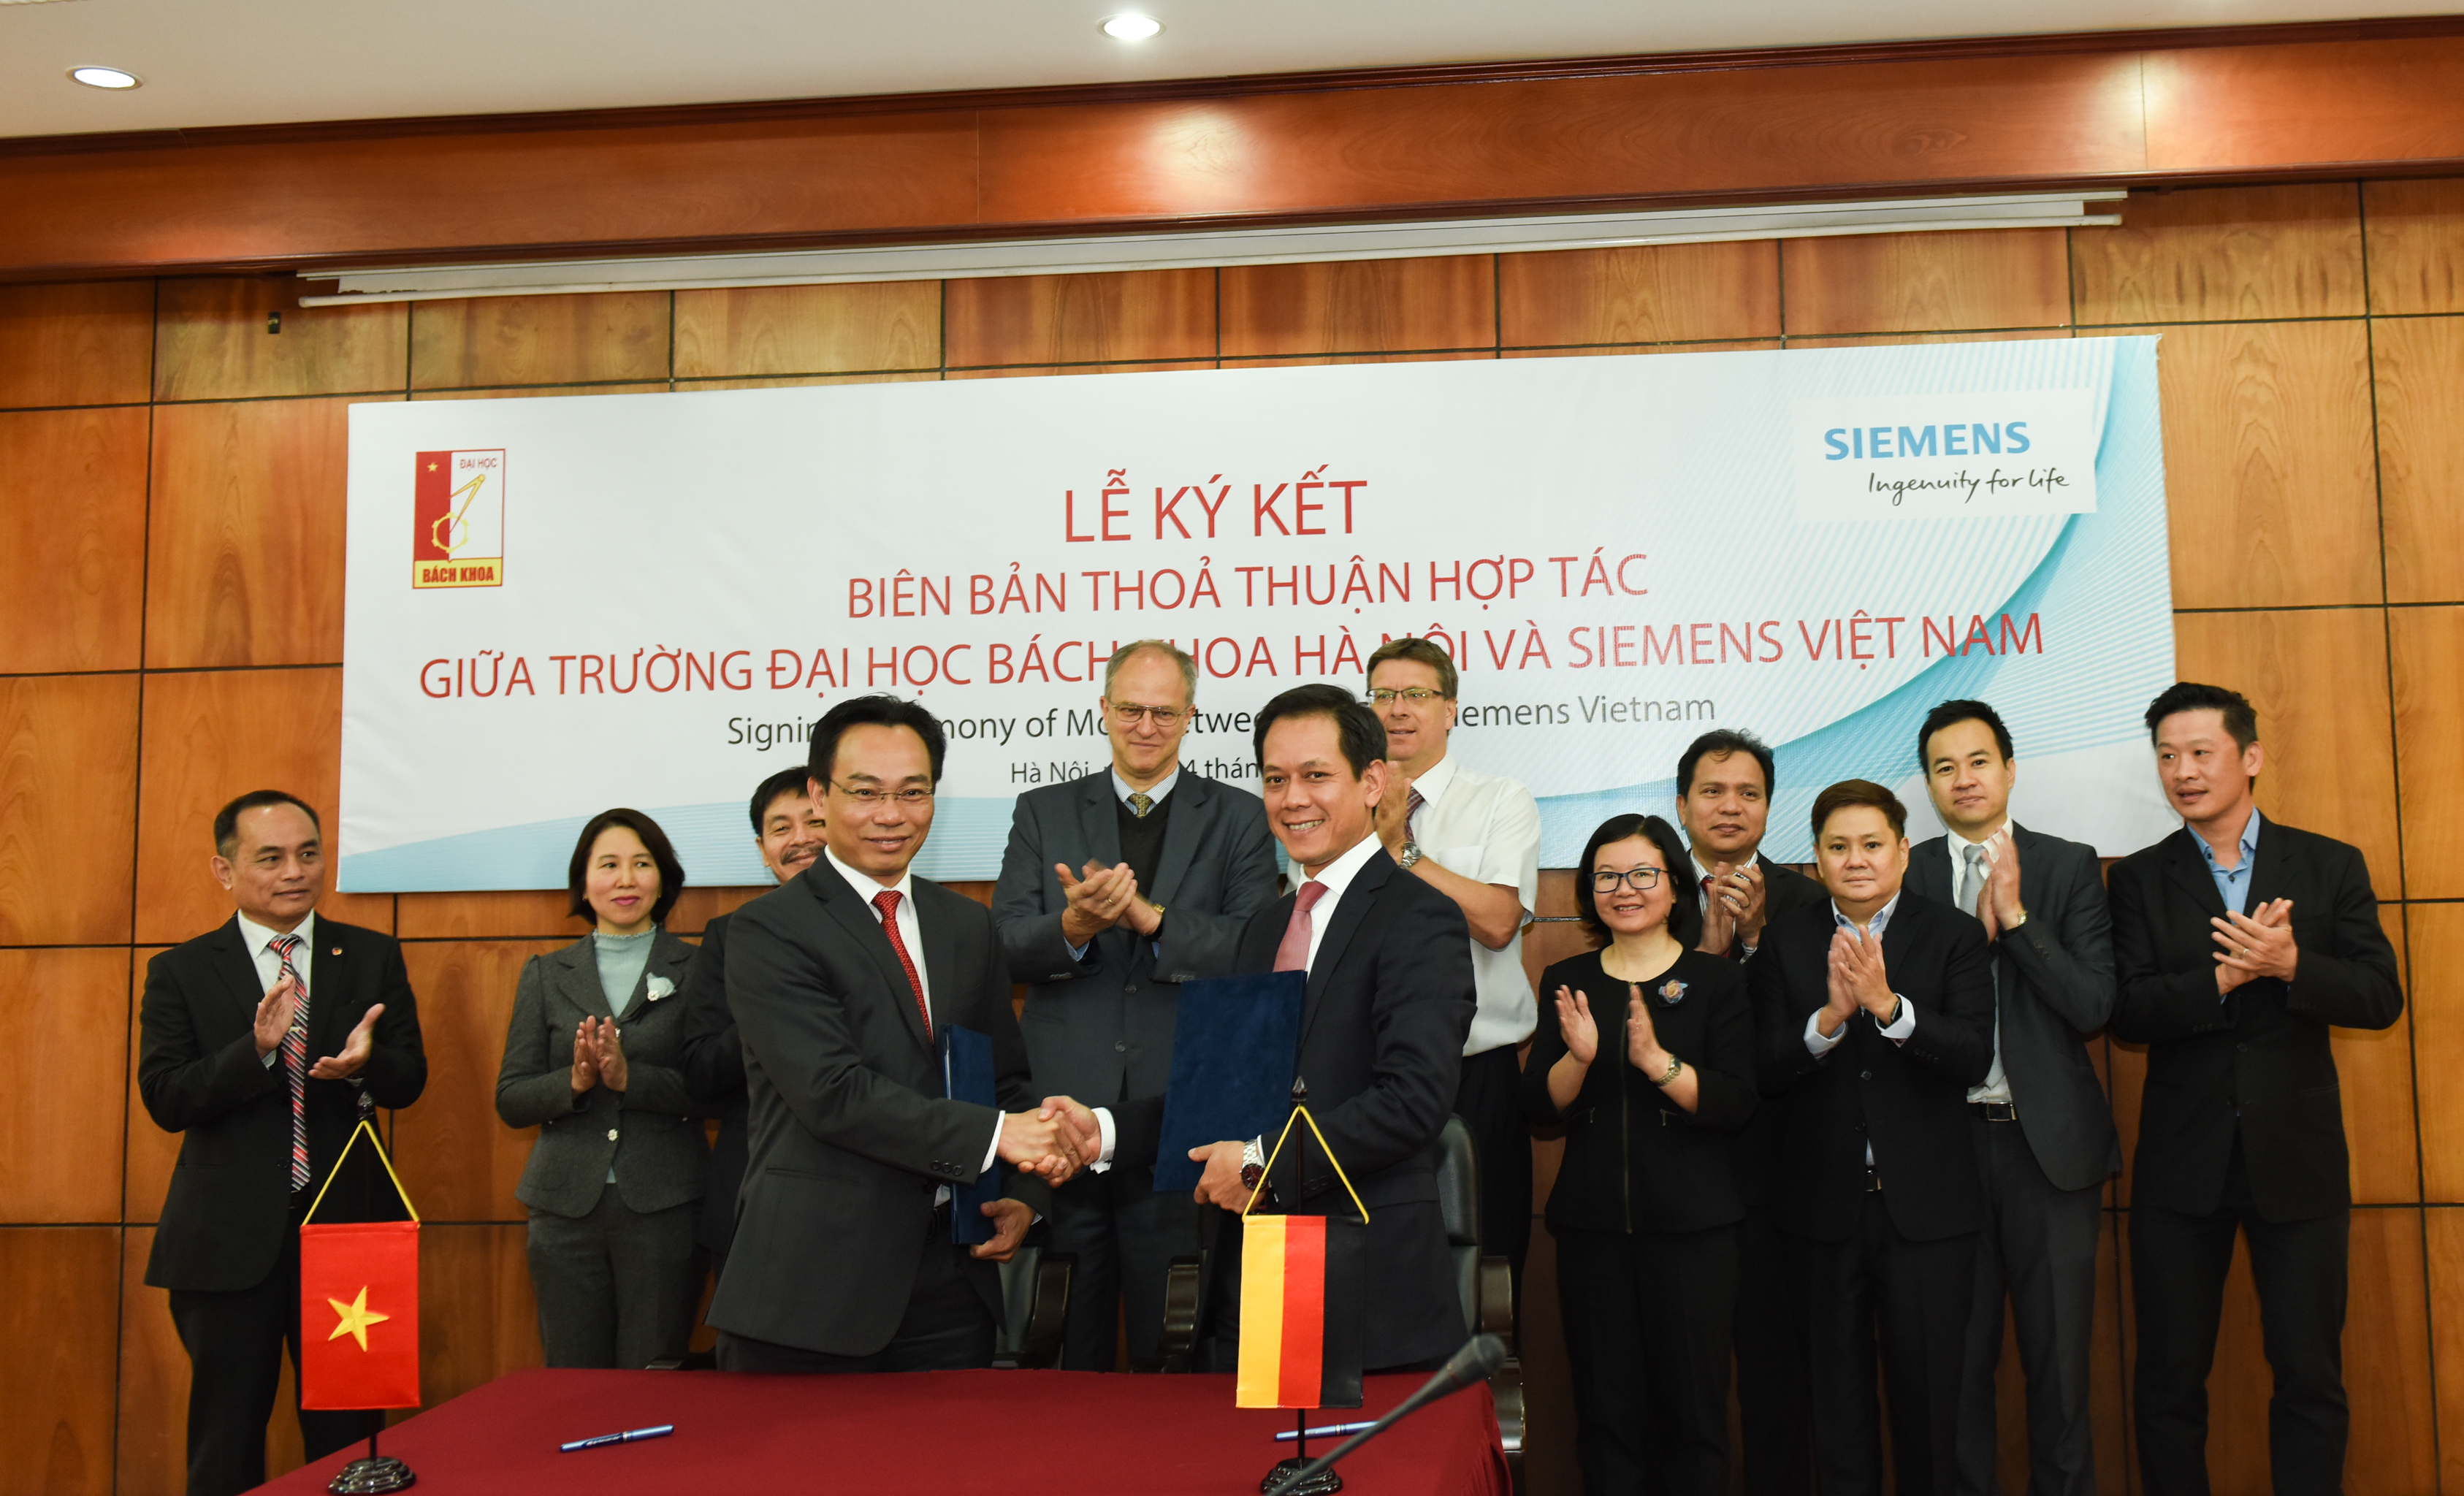 siemens fosters next generation of digital talent in vietnam